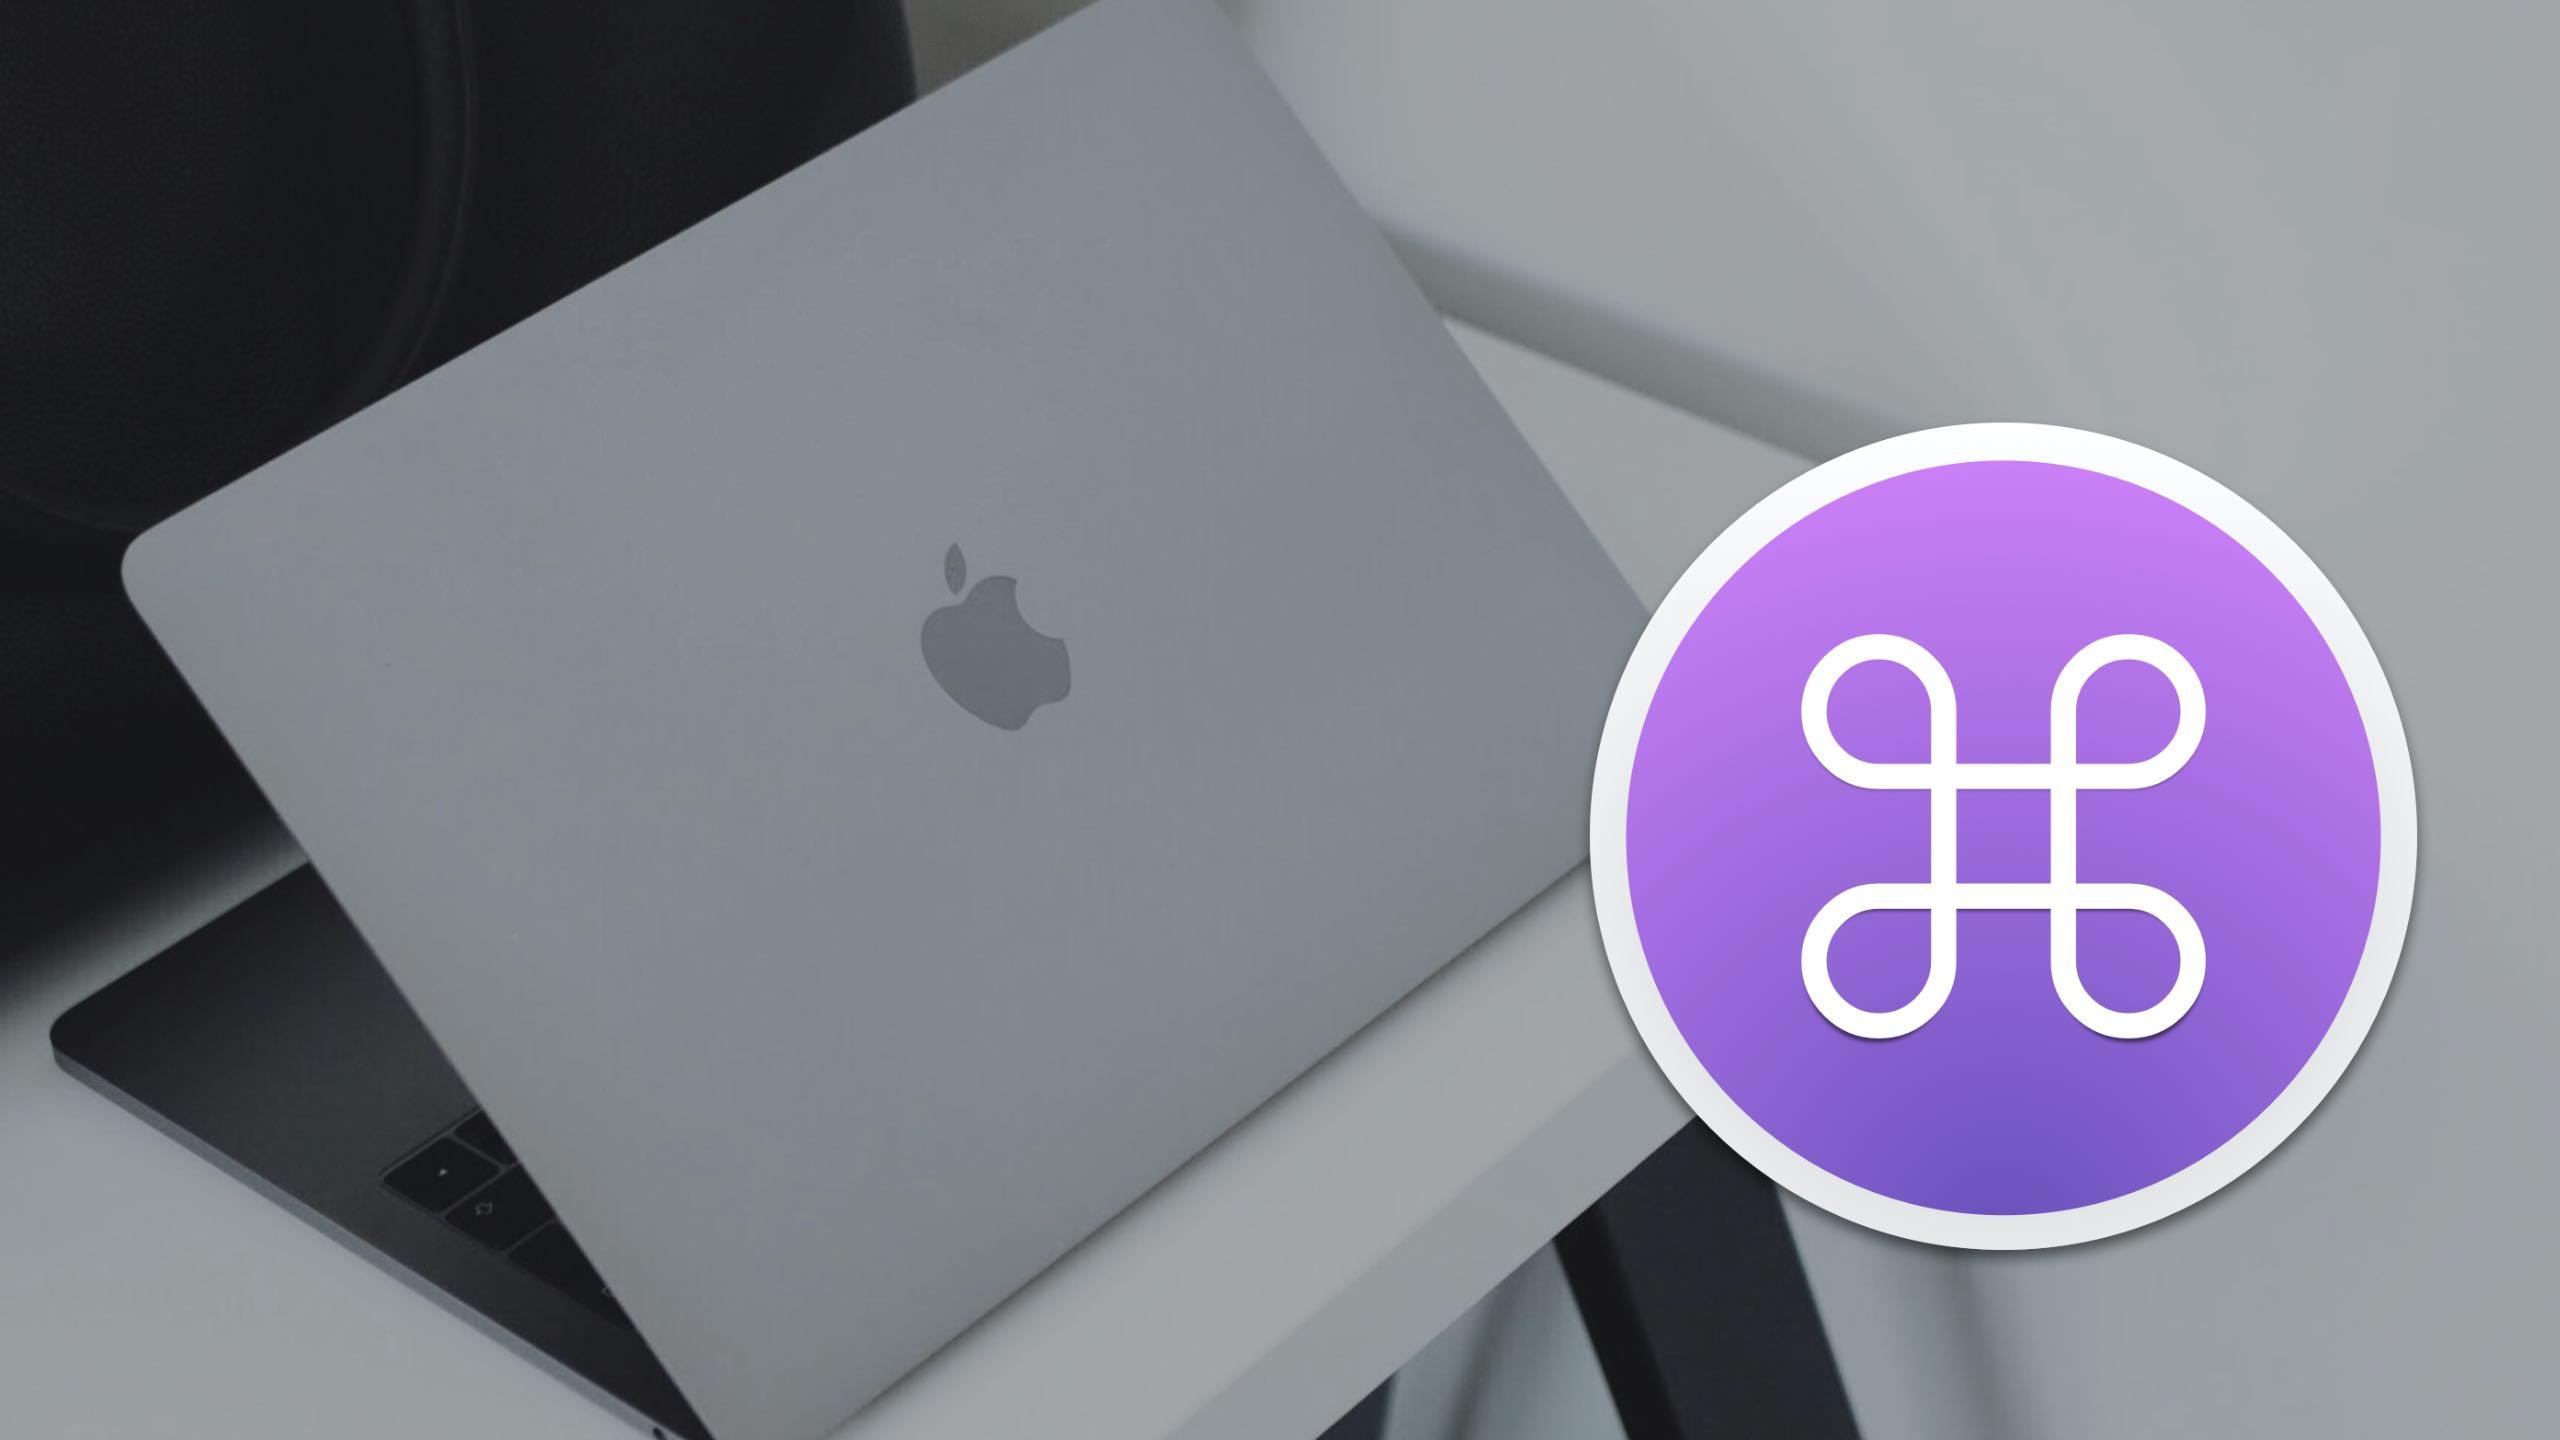 MacBookのおすすめ必須アプリ11選|英かな